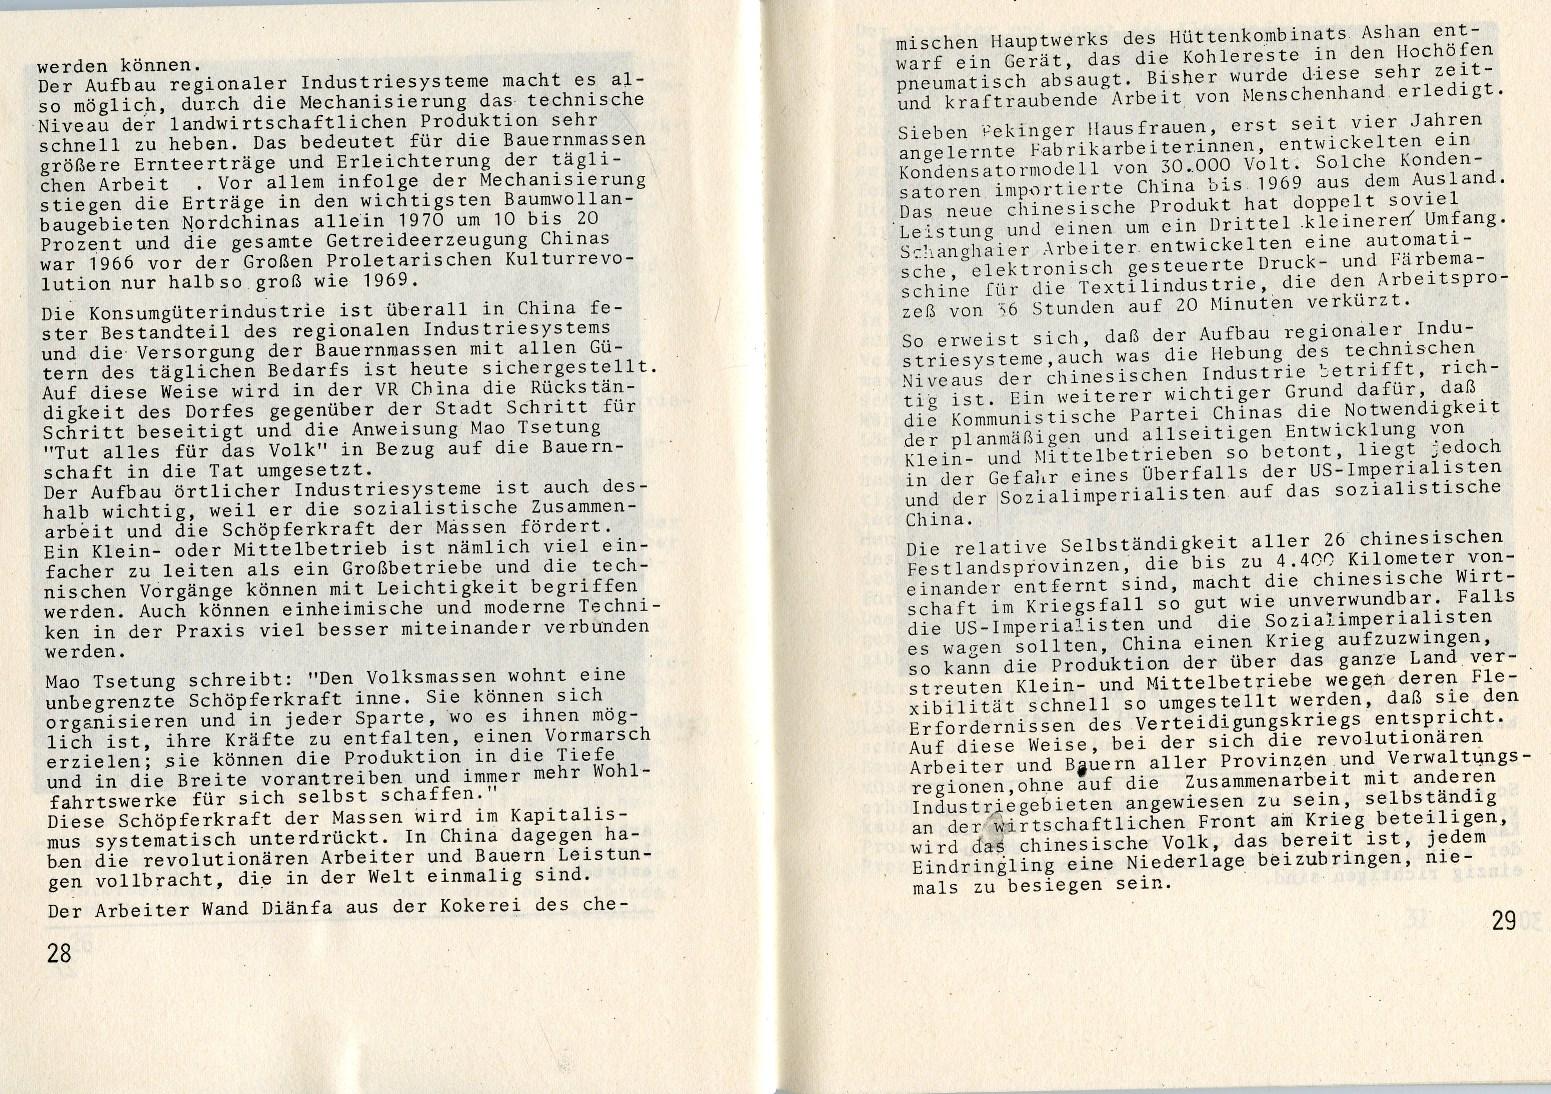 ZB_KPChinas_1971_16